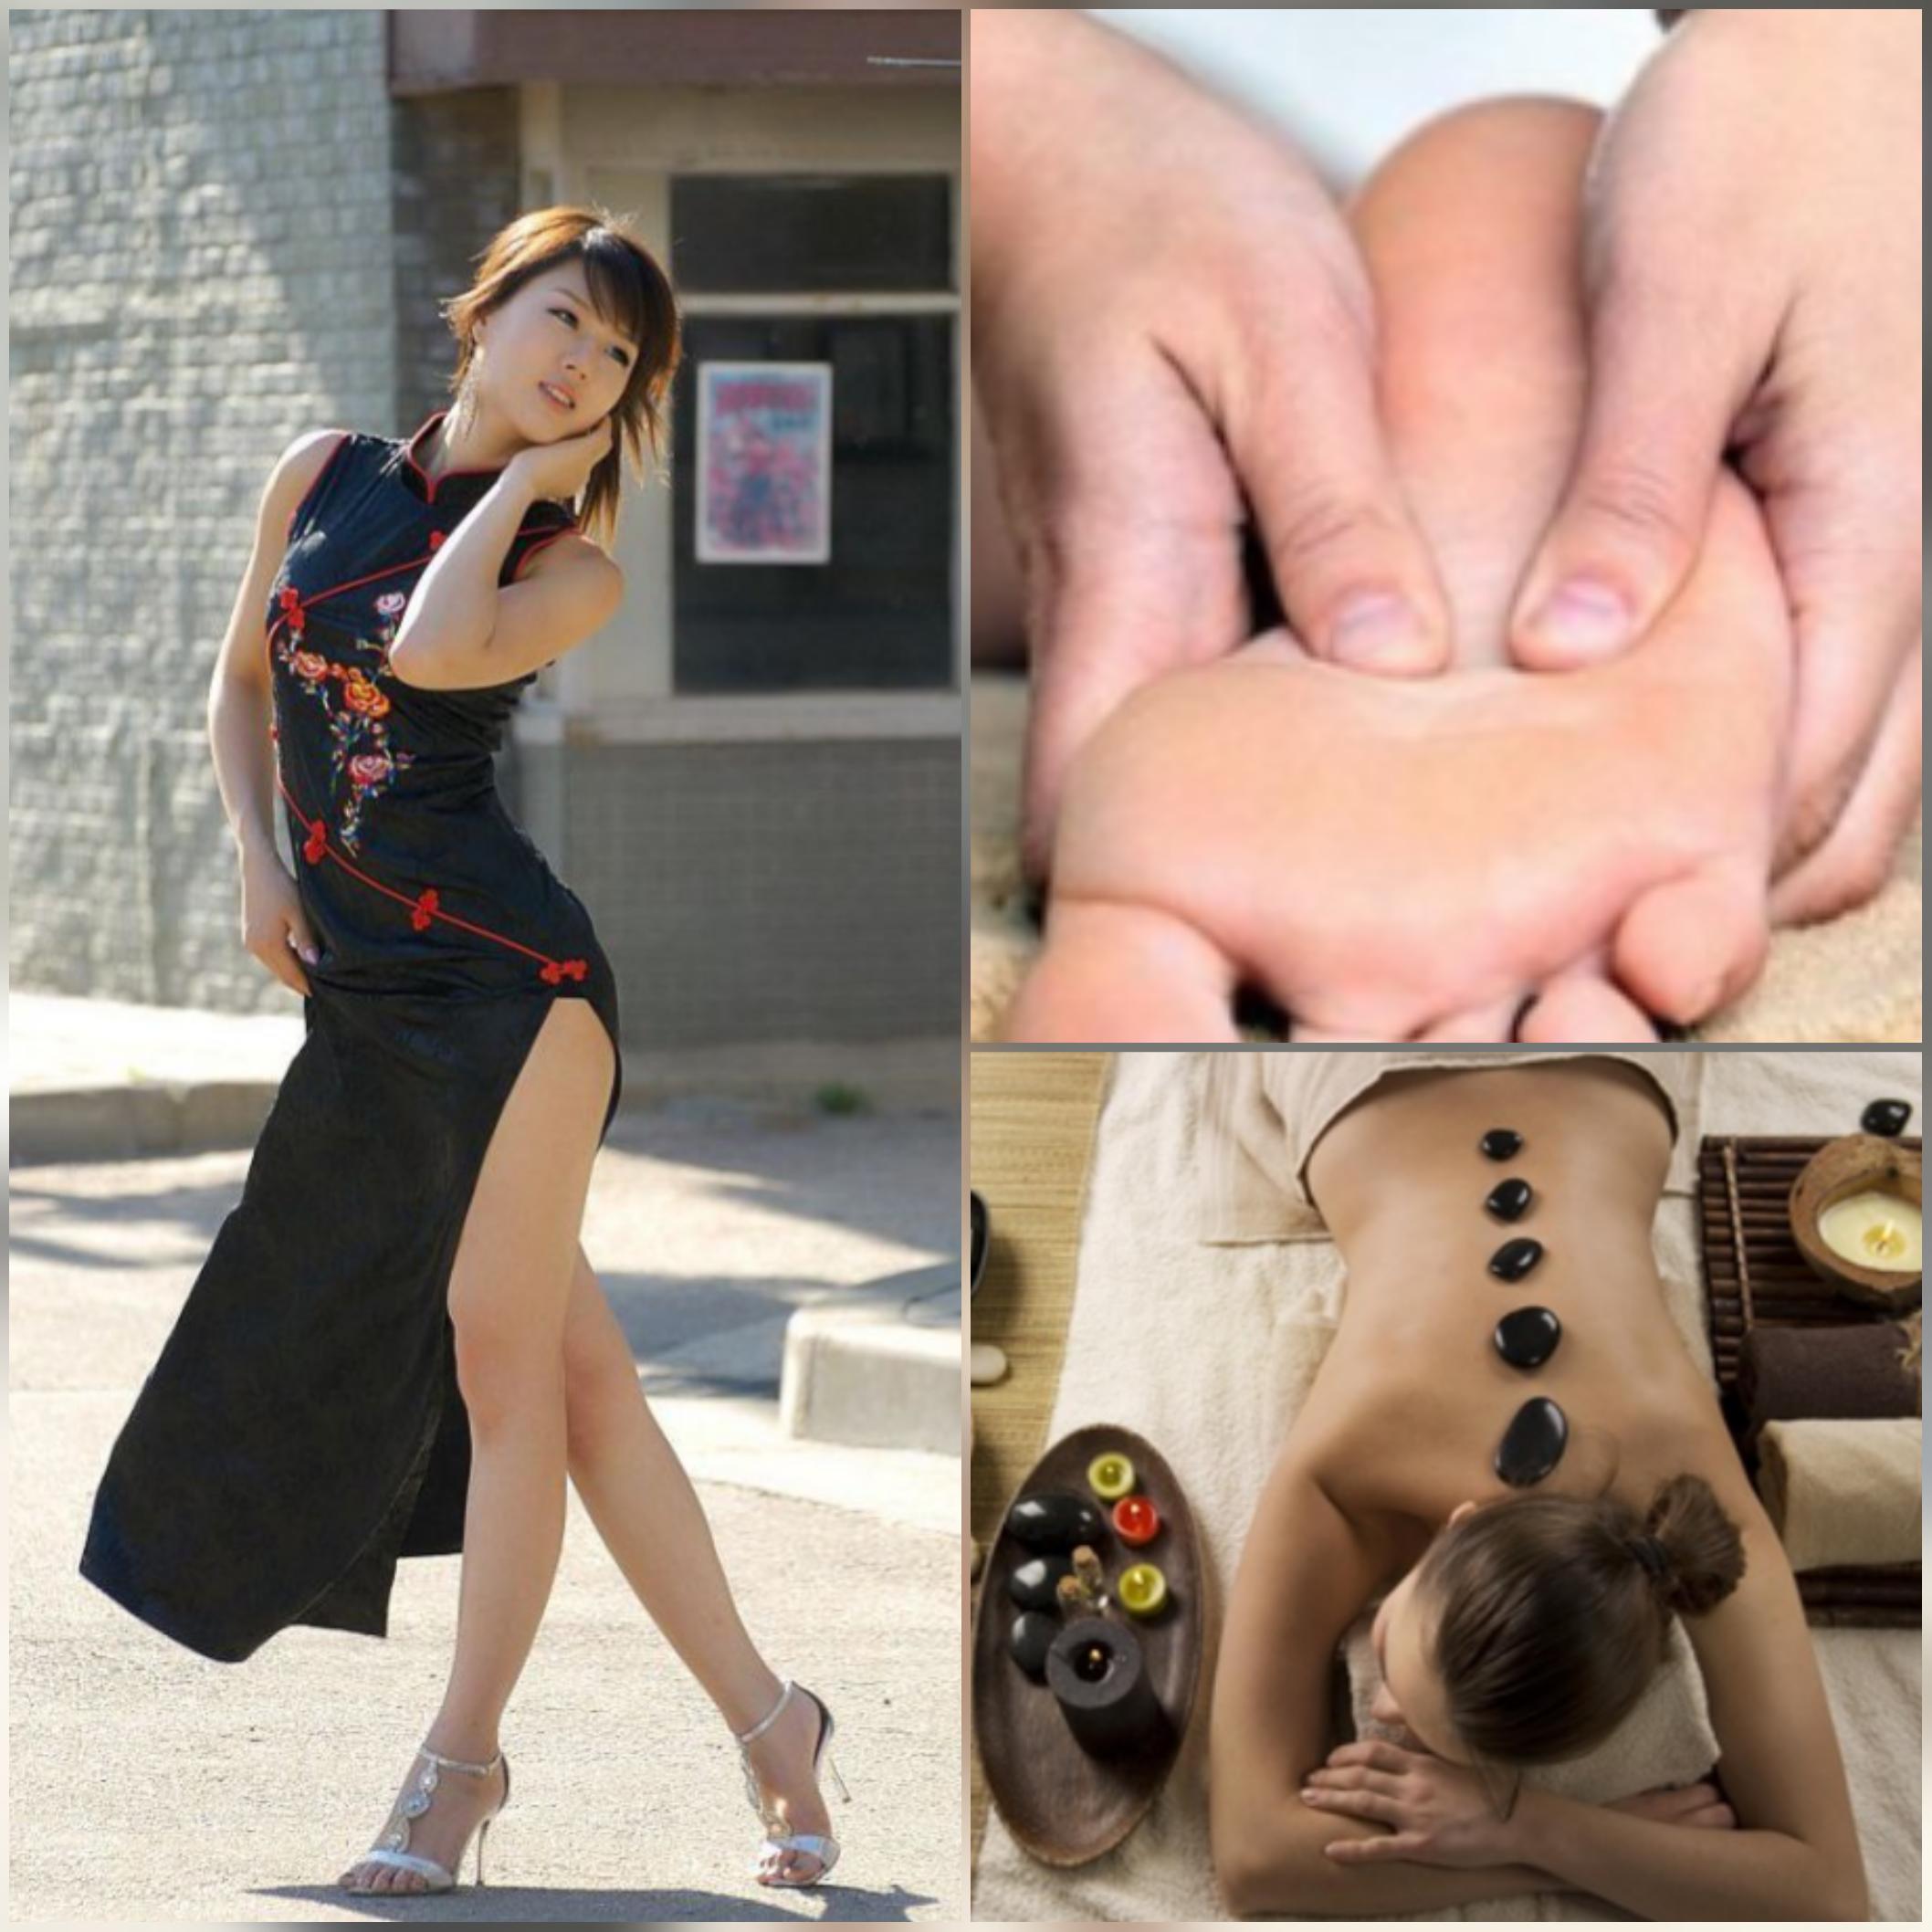 massage bay Asian tampa